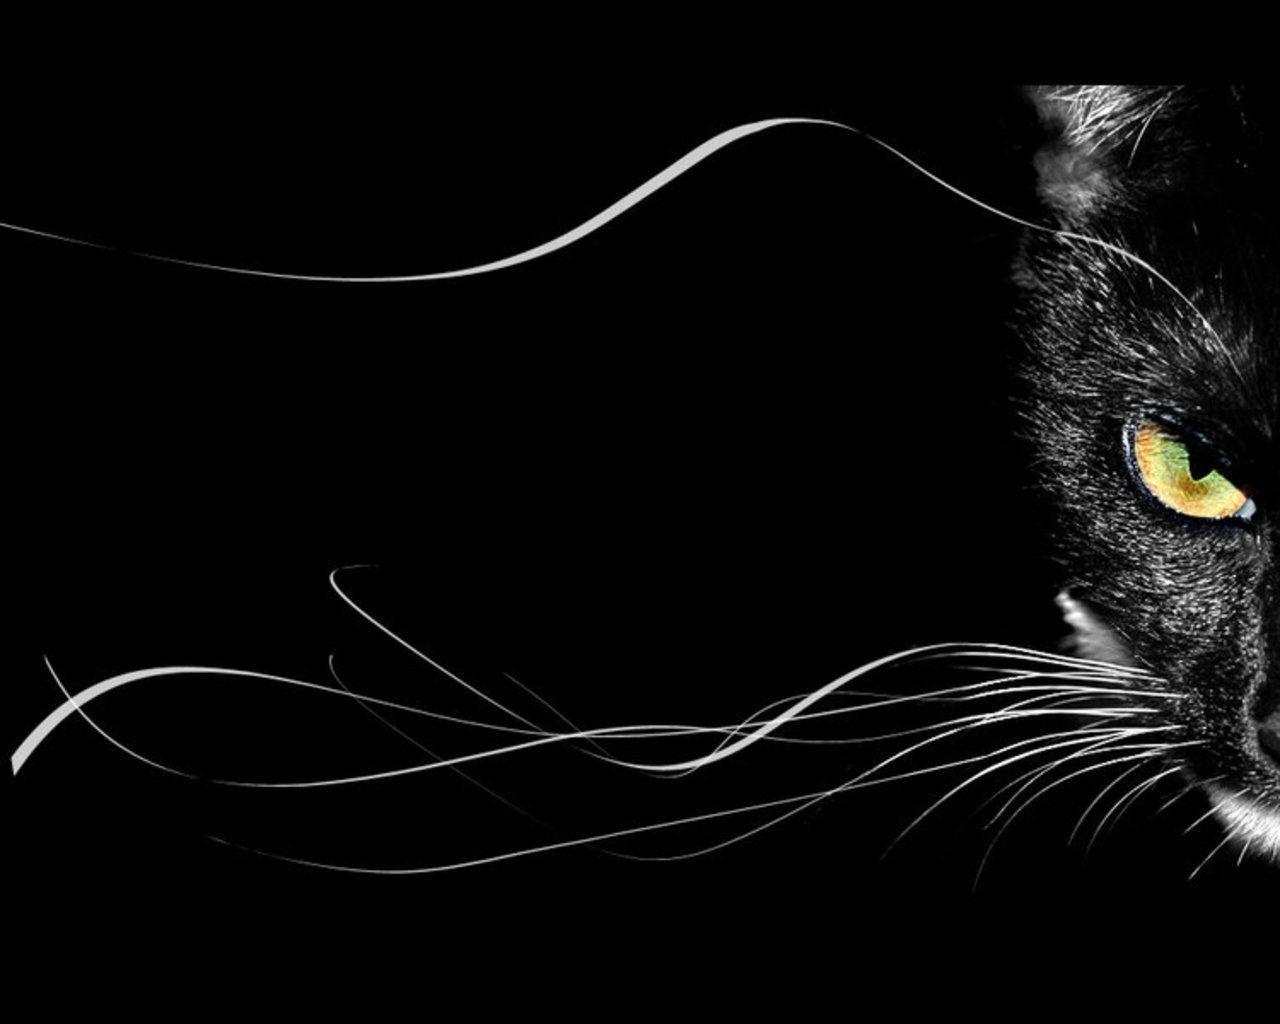 Black Cat Cartoon Wallpapers Top Free Black Cat Cartoon Backgrounds Wallpaperaccess